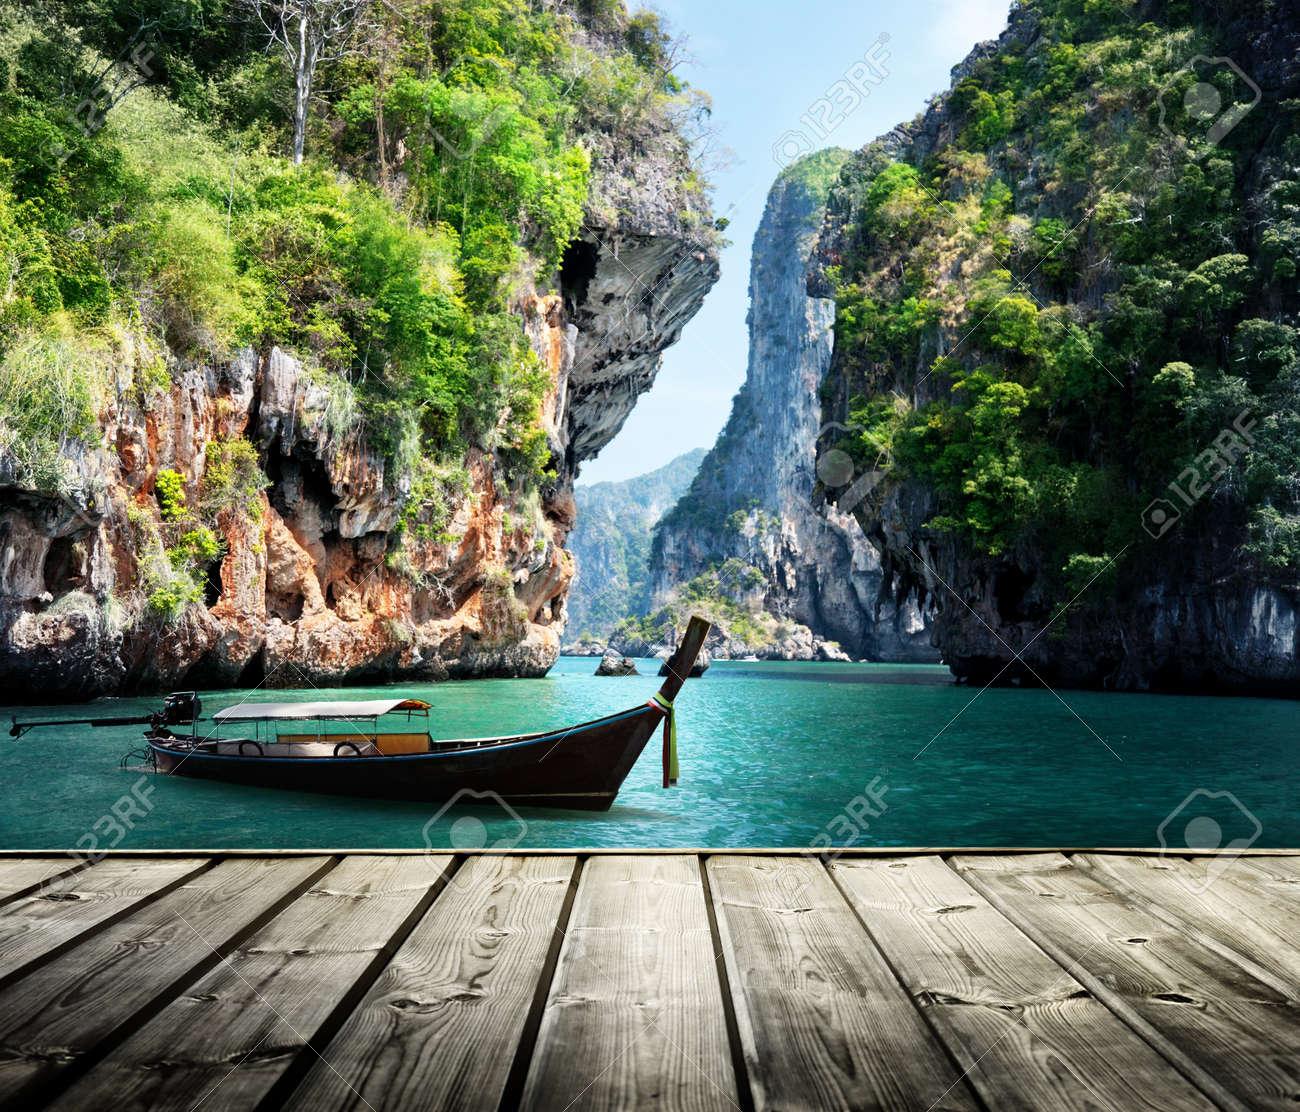 long boat and rocks on railay beach in Krabi, Thailand Stock Photo - 22109654